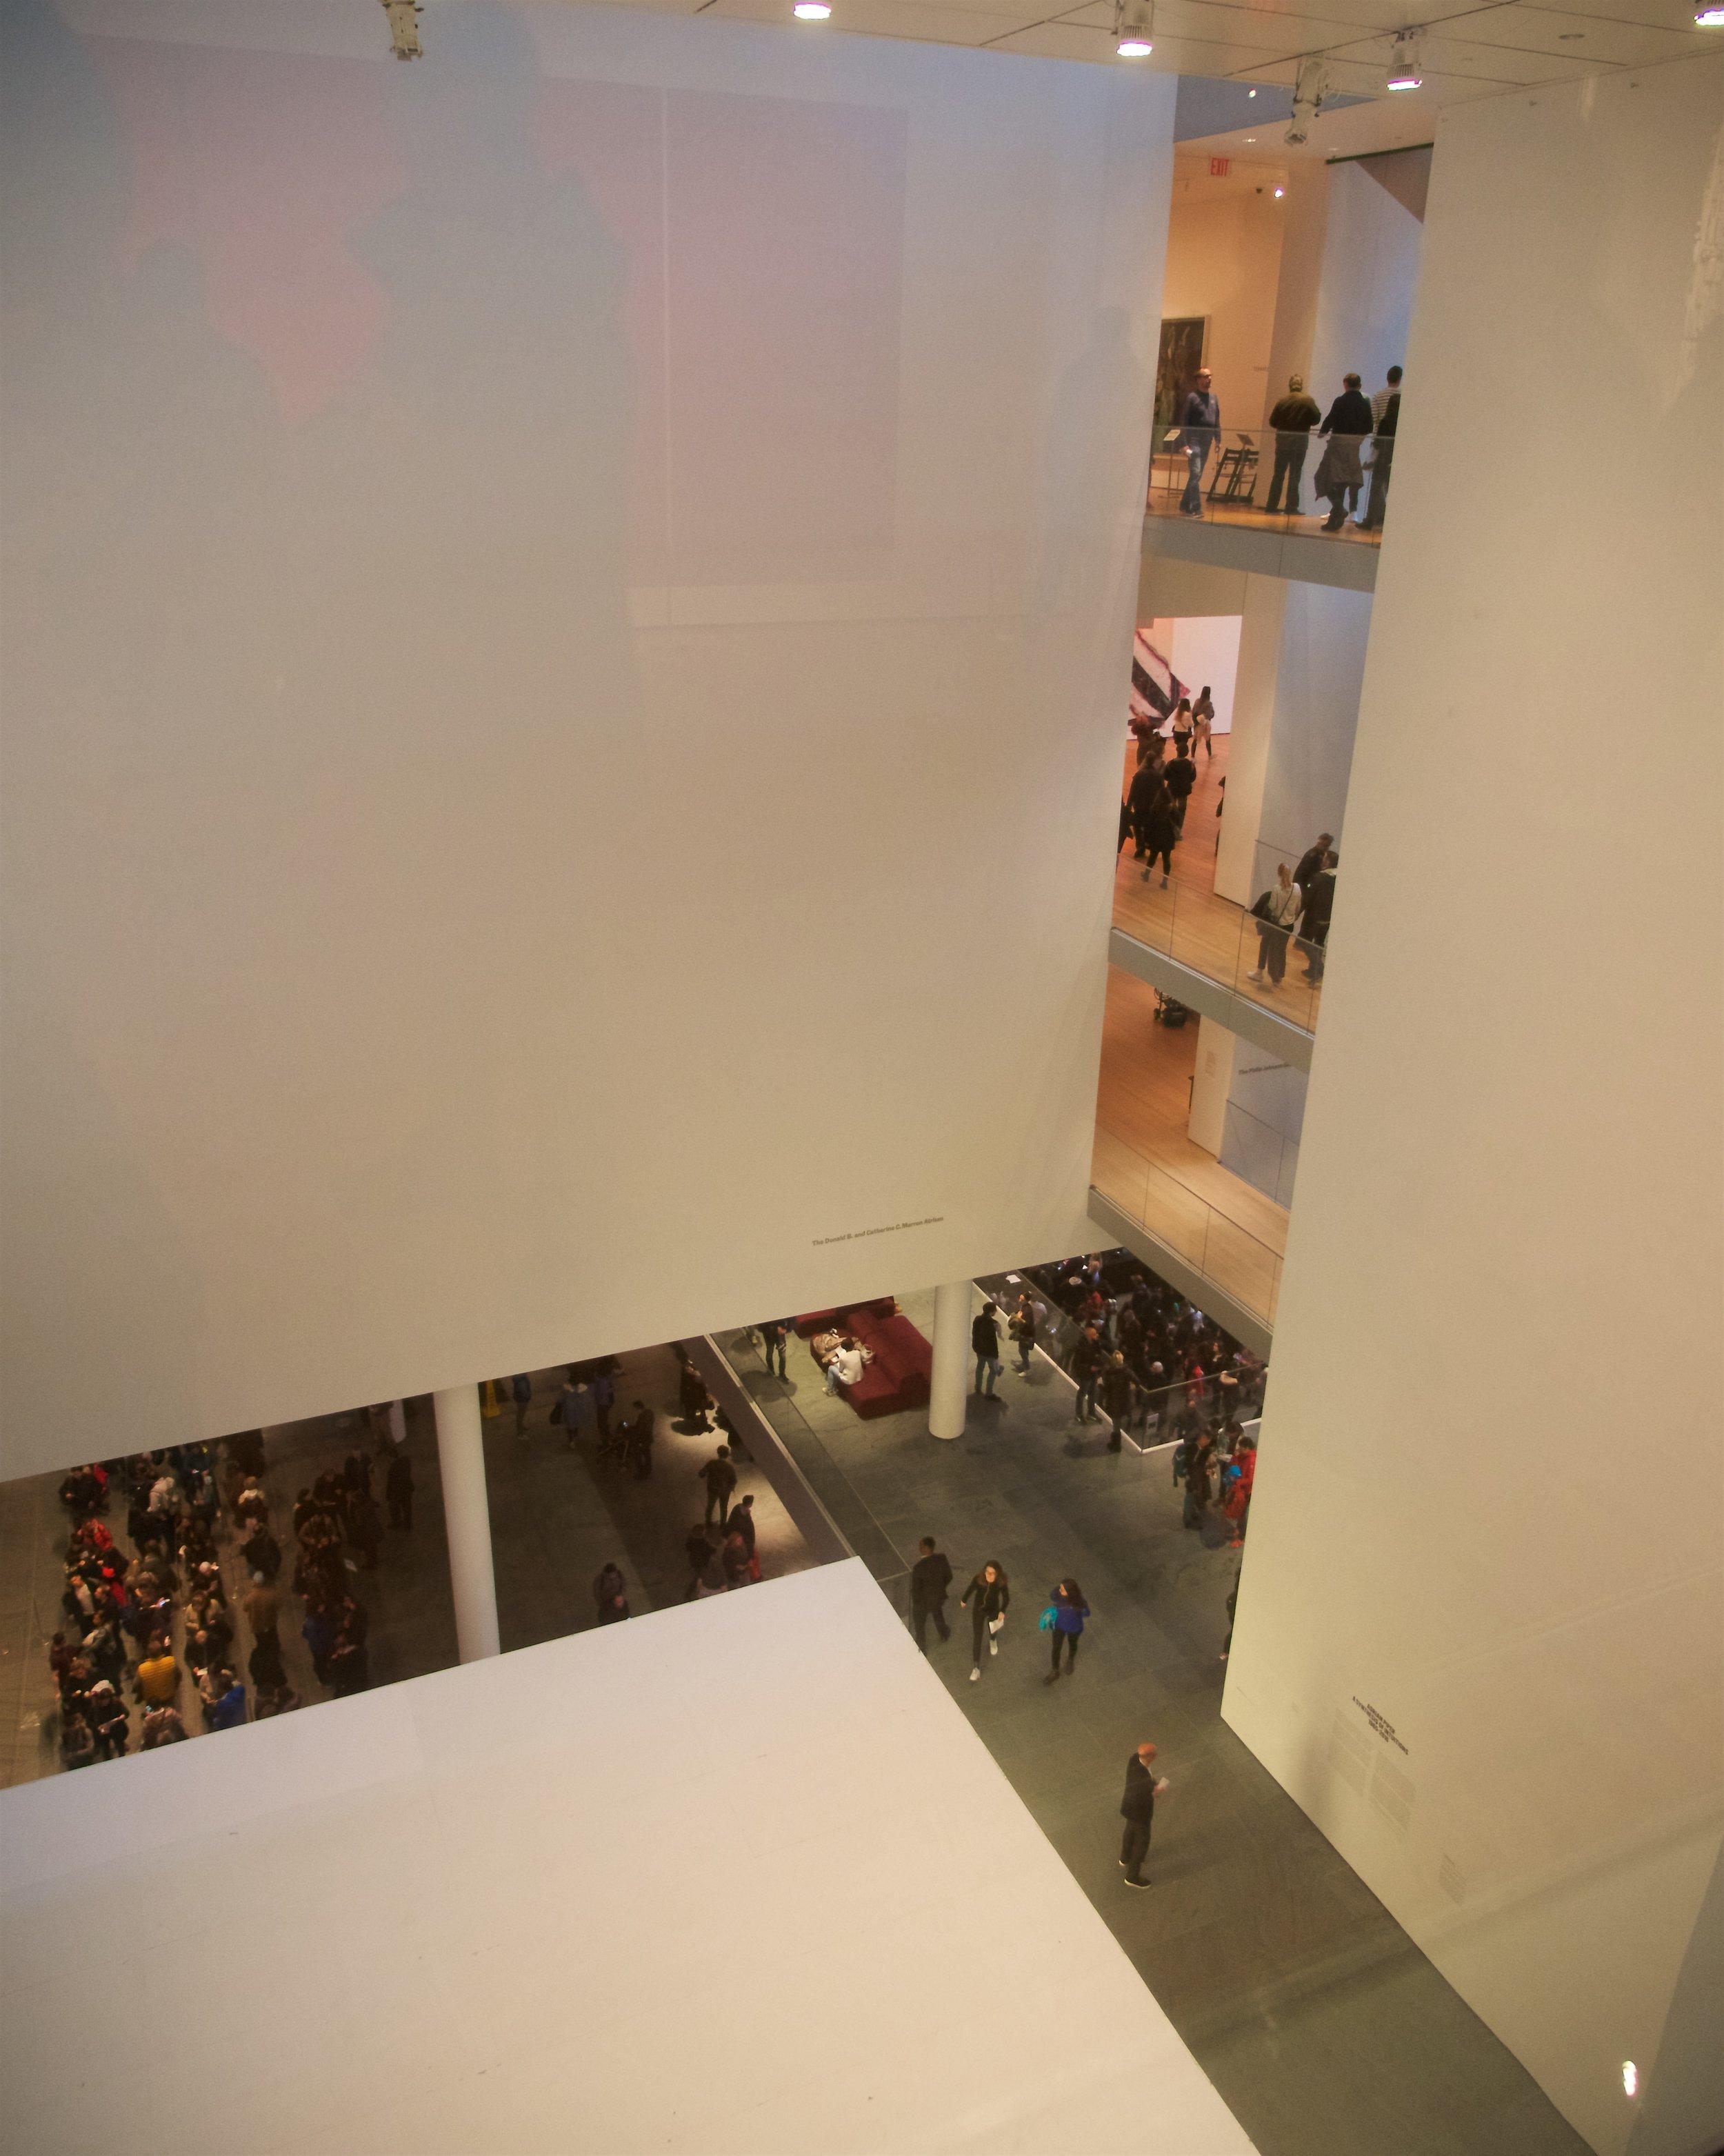 View of floors 1 through 4